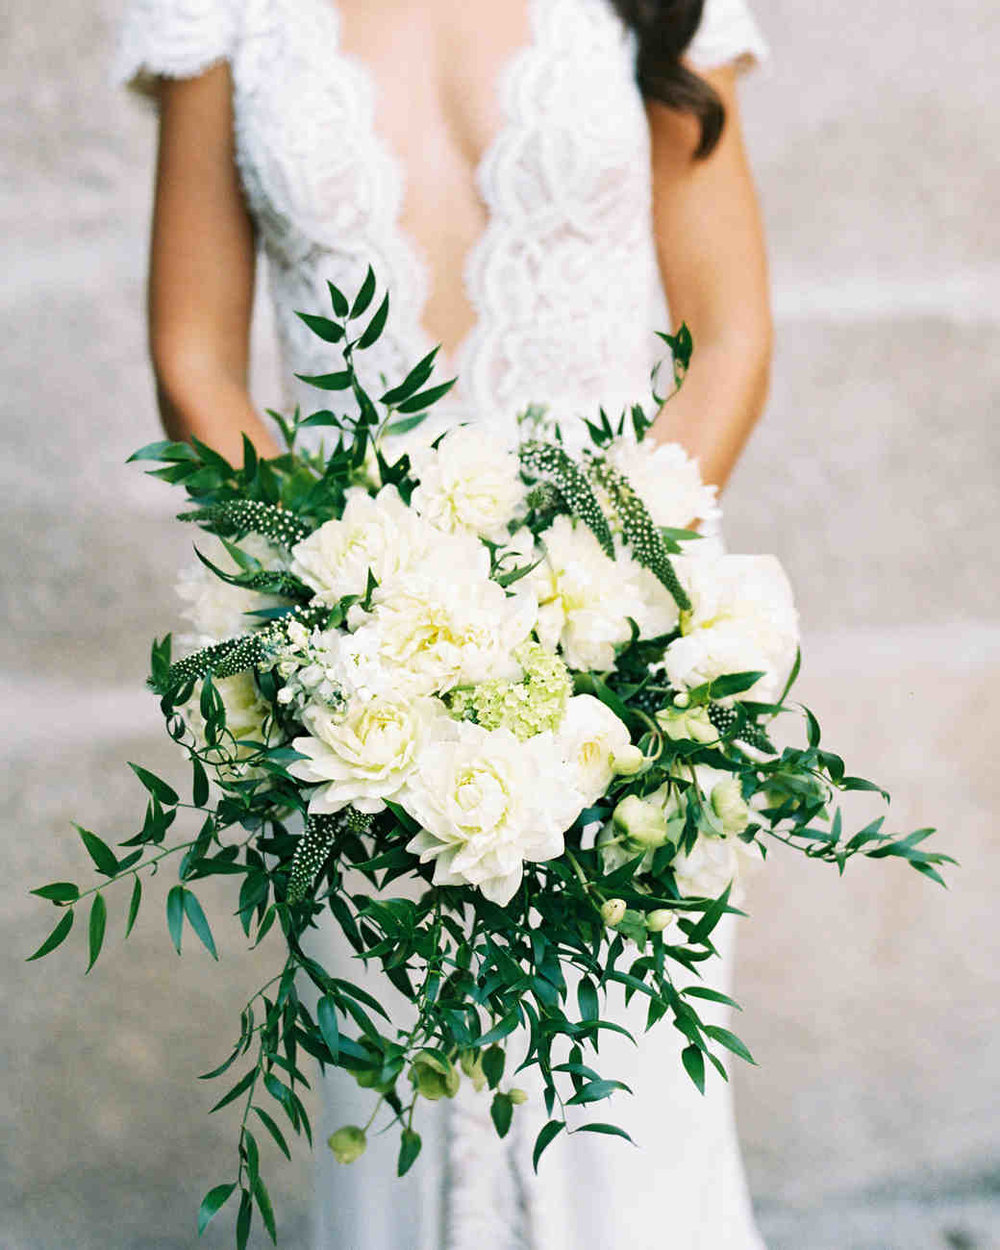 jeannette-taylor-wedding-portugal-bouquet-103118064_vert.jpg